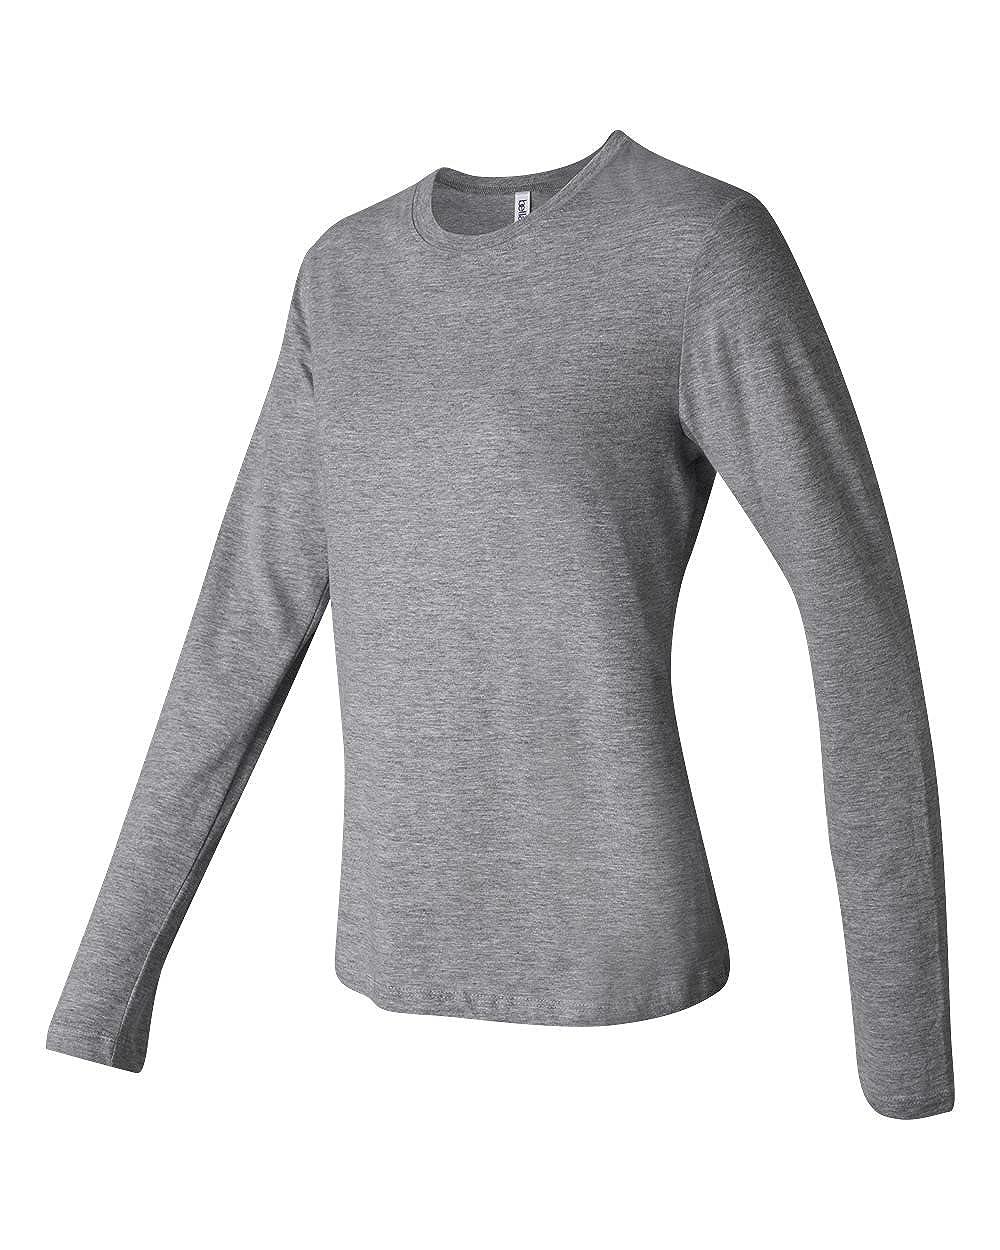 b7b991b01 Bella Women's Long Sleeve Crew Neck Jersey T-Shirt B6500 at Amazon Women's  Clothing store: